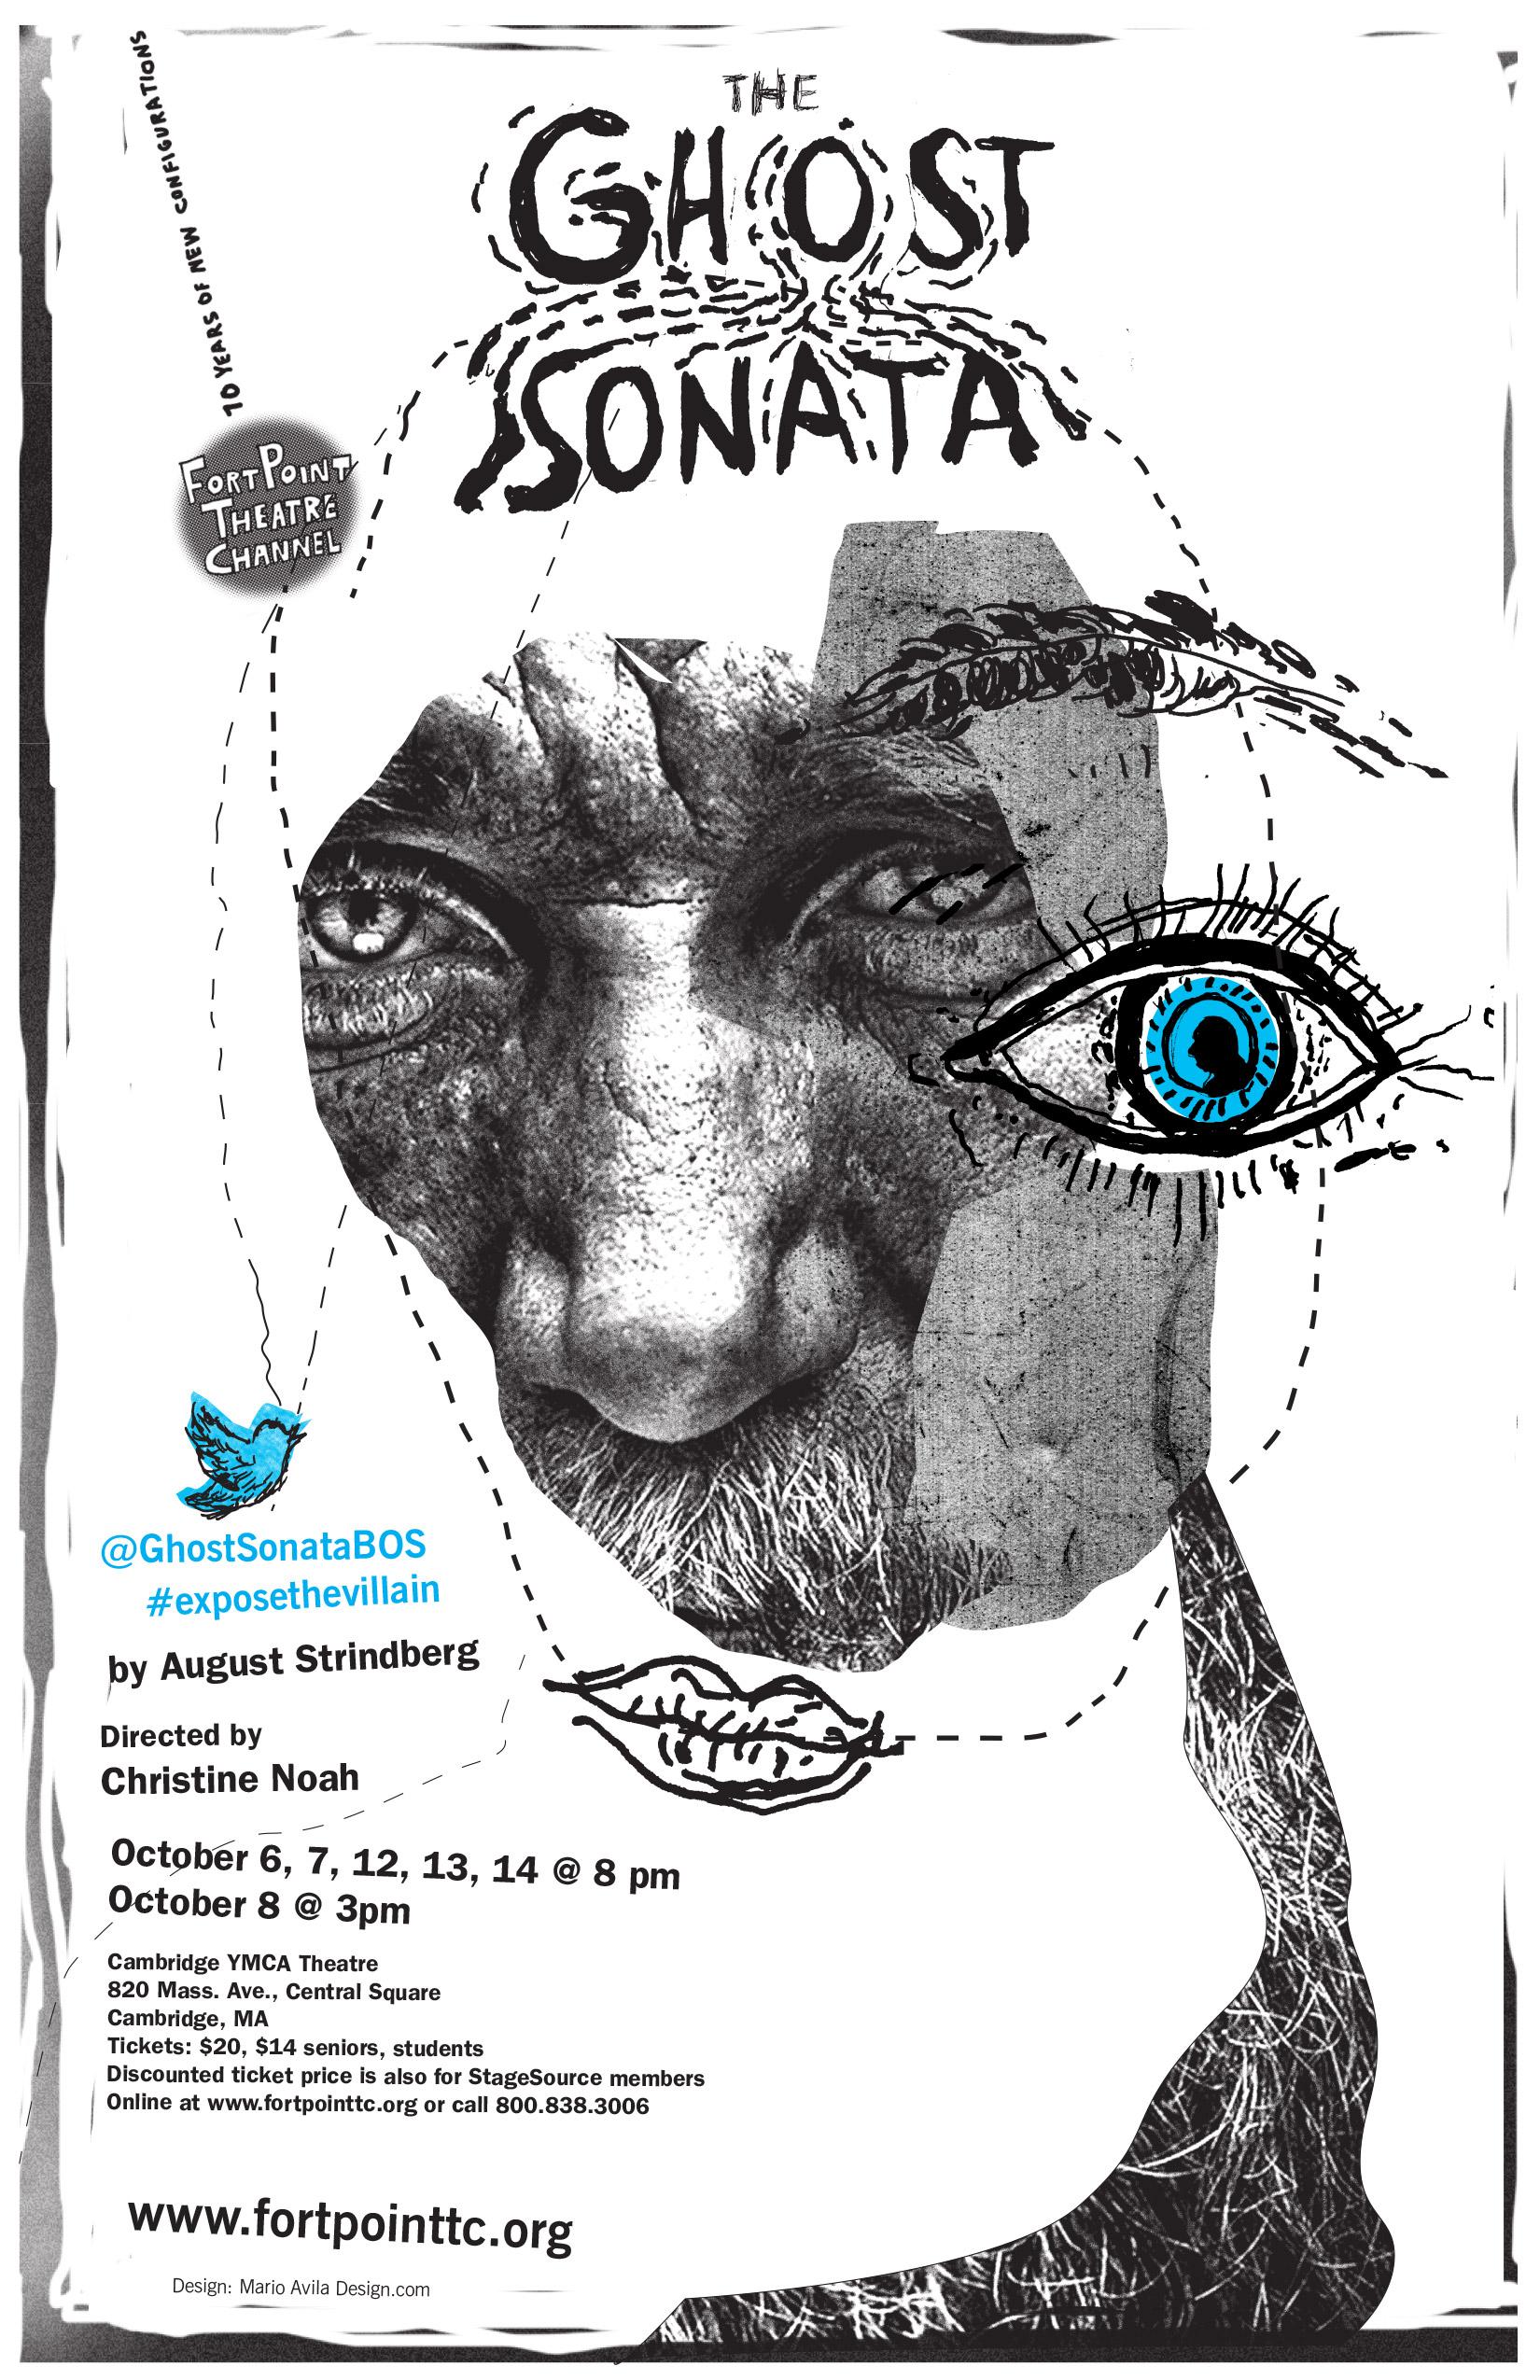 01_ghost_sonata_poster_image.jpg